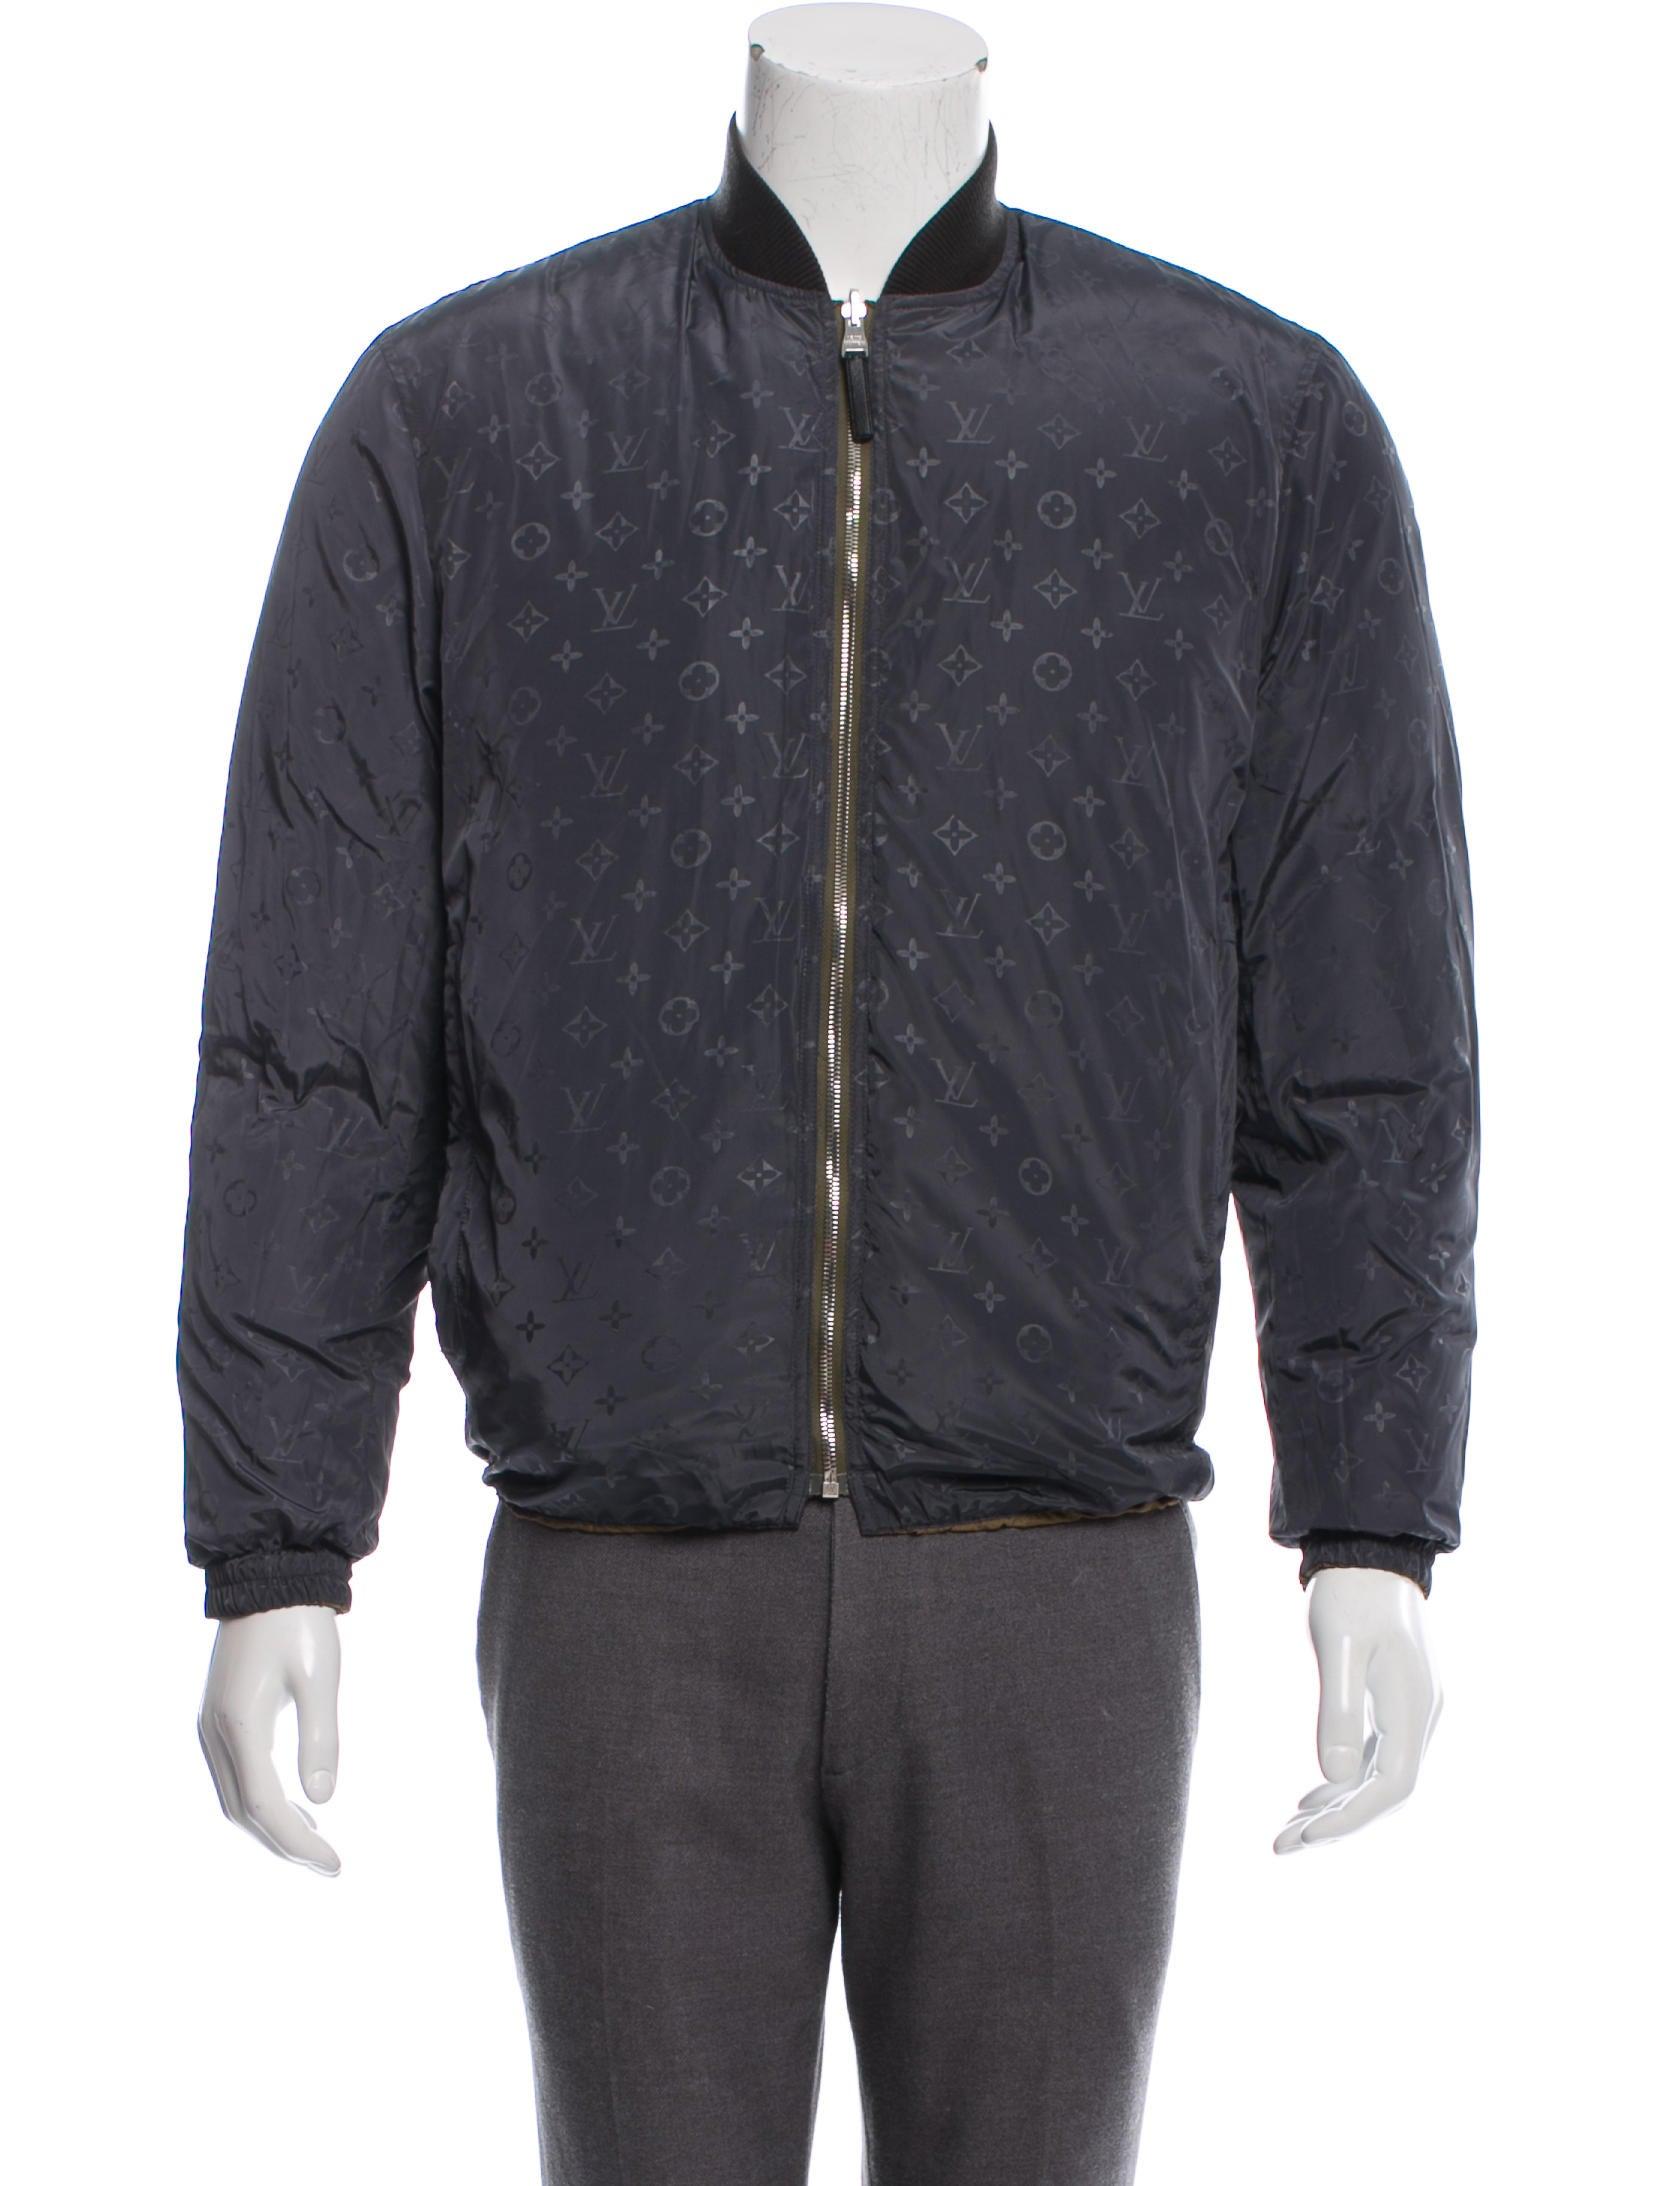 yeezy adidas jacket louis vuitton